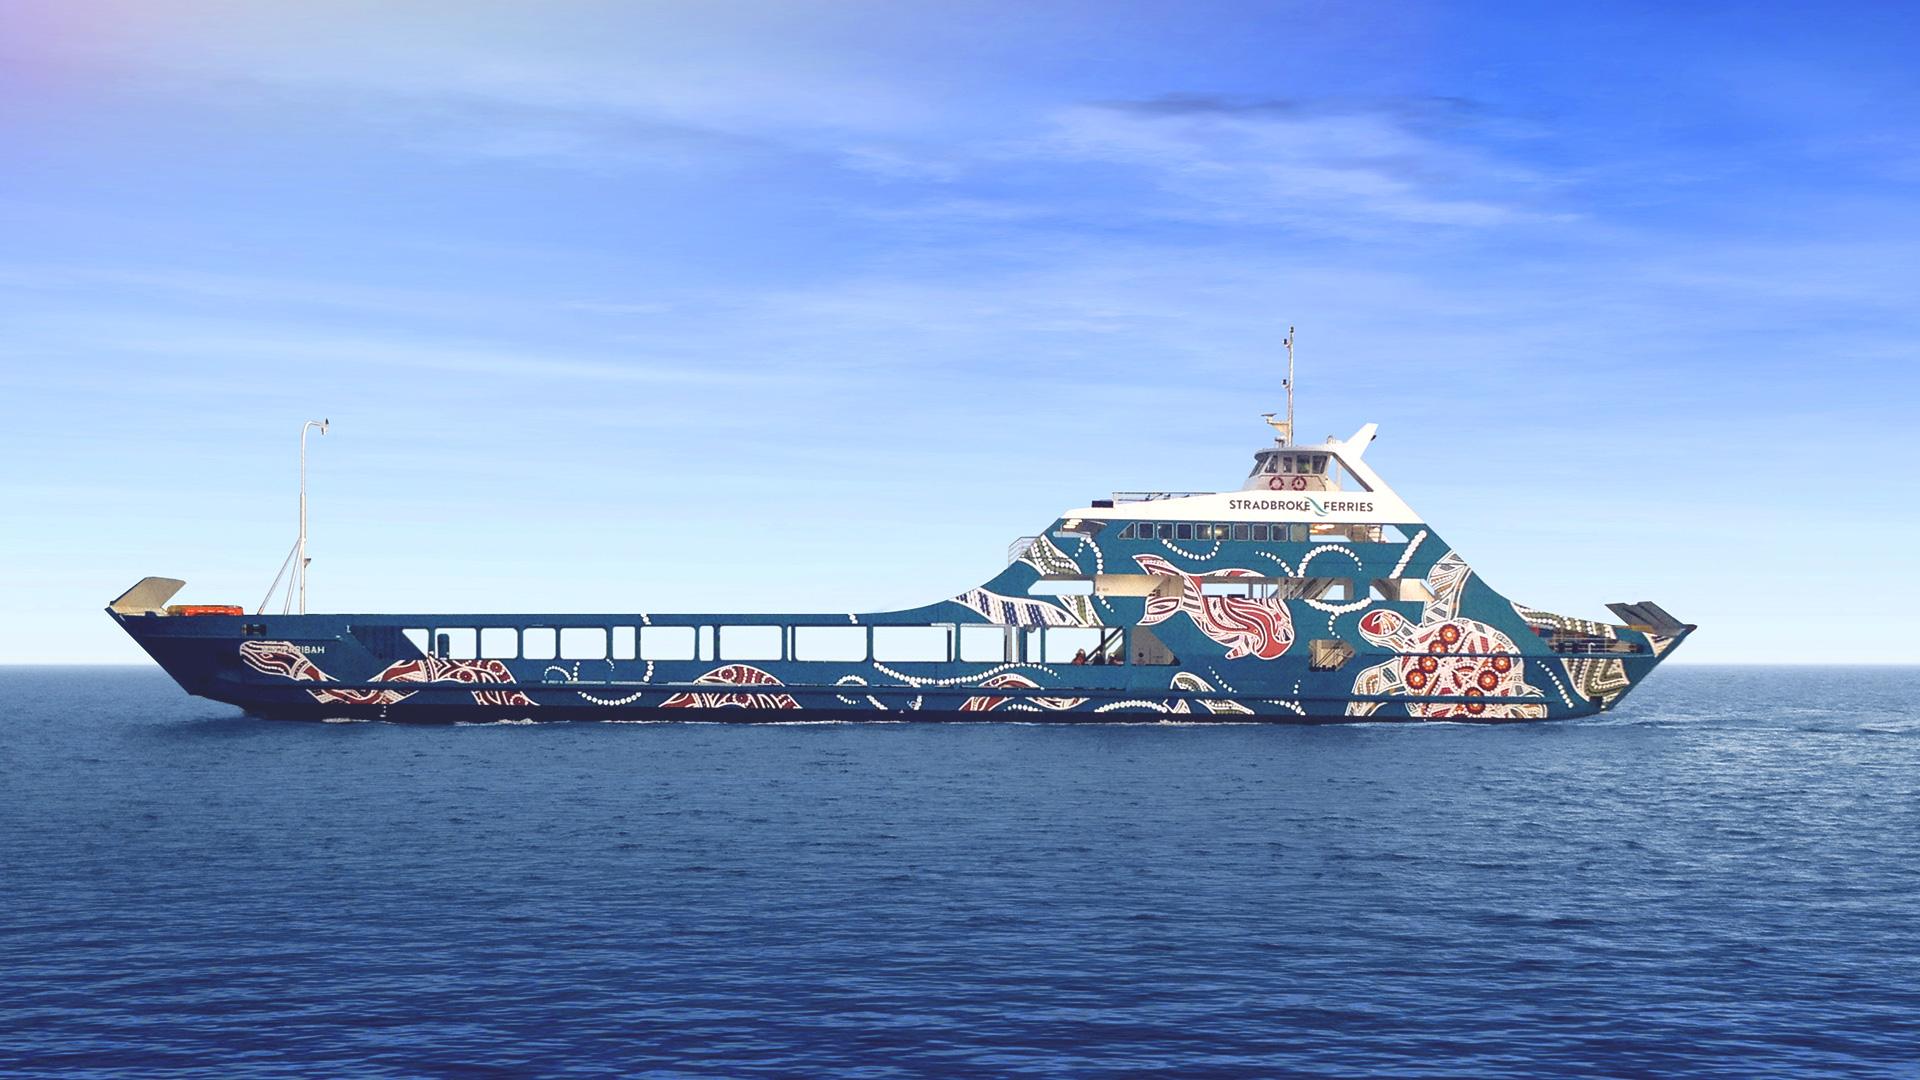 Stradbroke Ferries ferry decorated in artwork by local Aboriginal artist